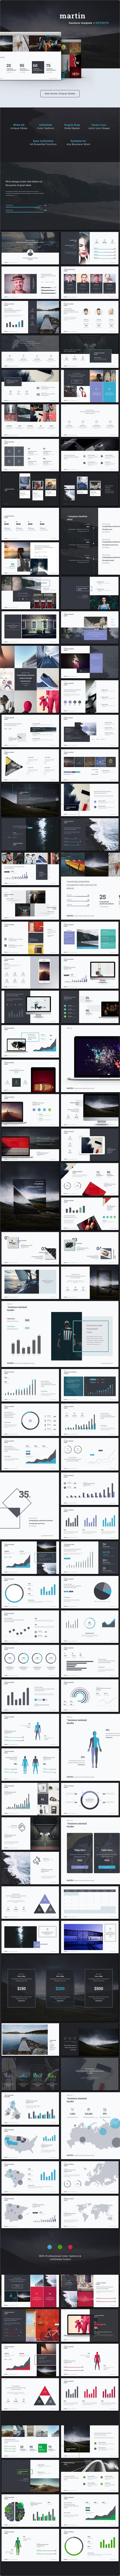 Best 111 Presentation | Design ideas on Pinterest | Presentation ...